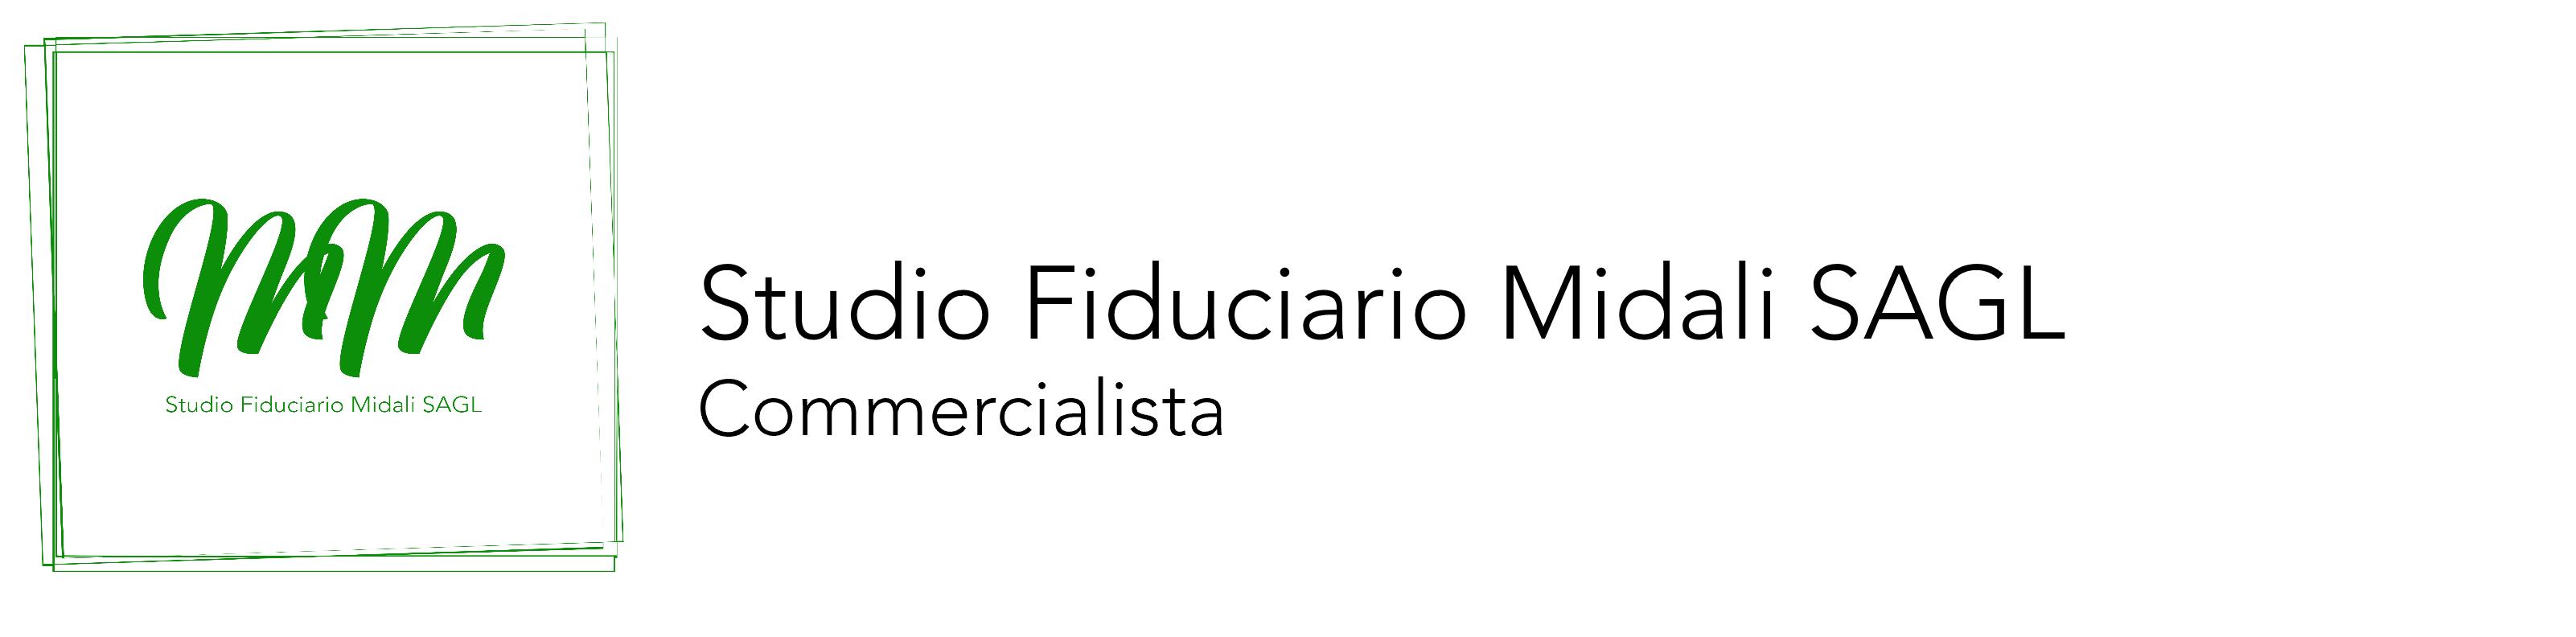 Studio Fiduciario Midali SAGL